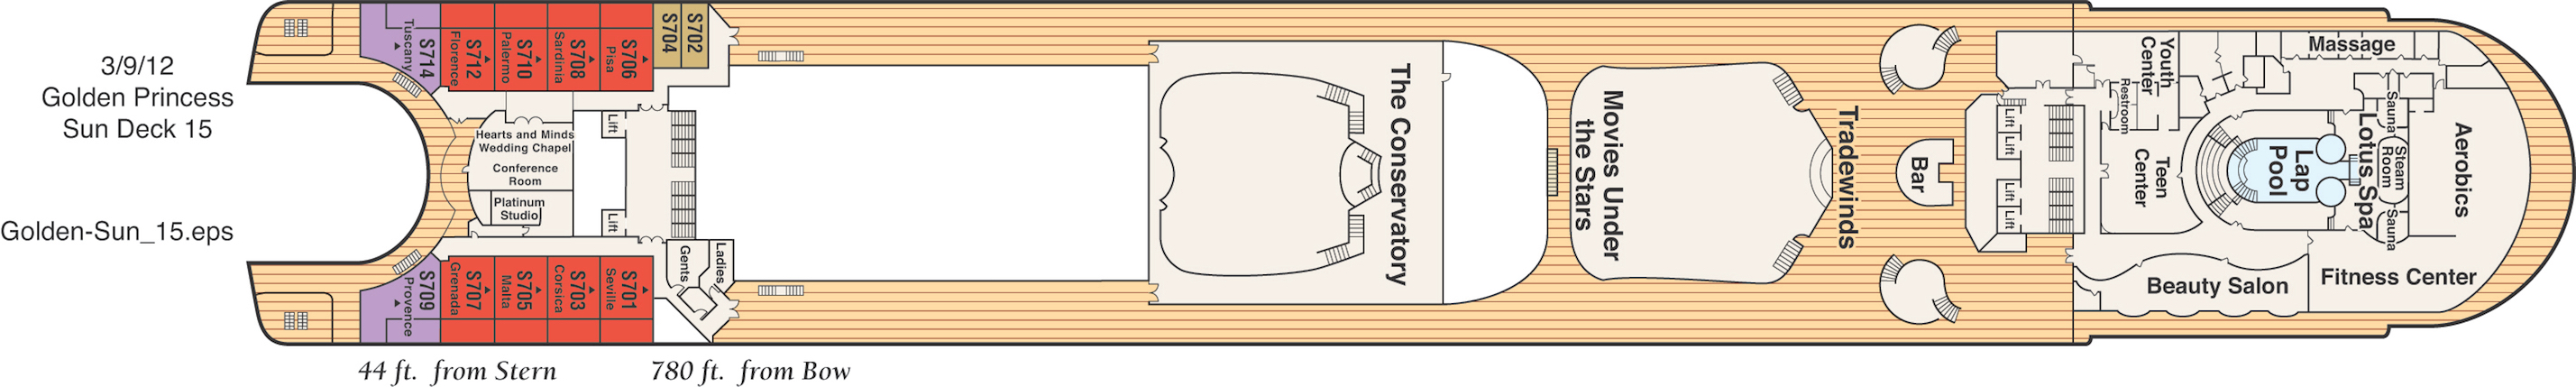 Princess Cruises Grand Class Golden Princess Deck 15.jpg